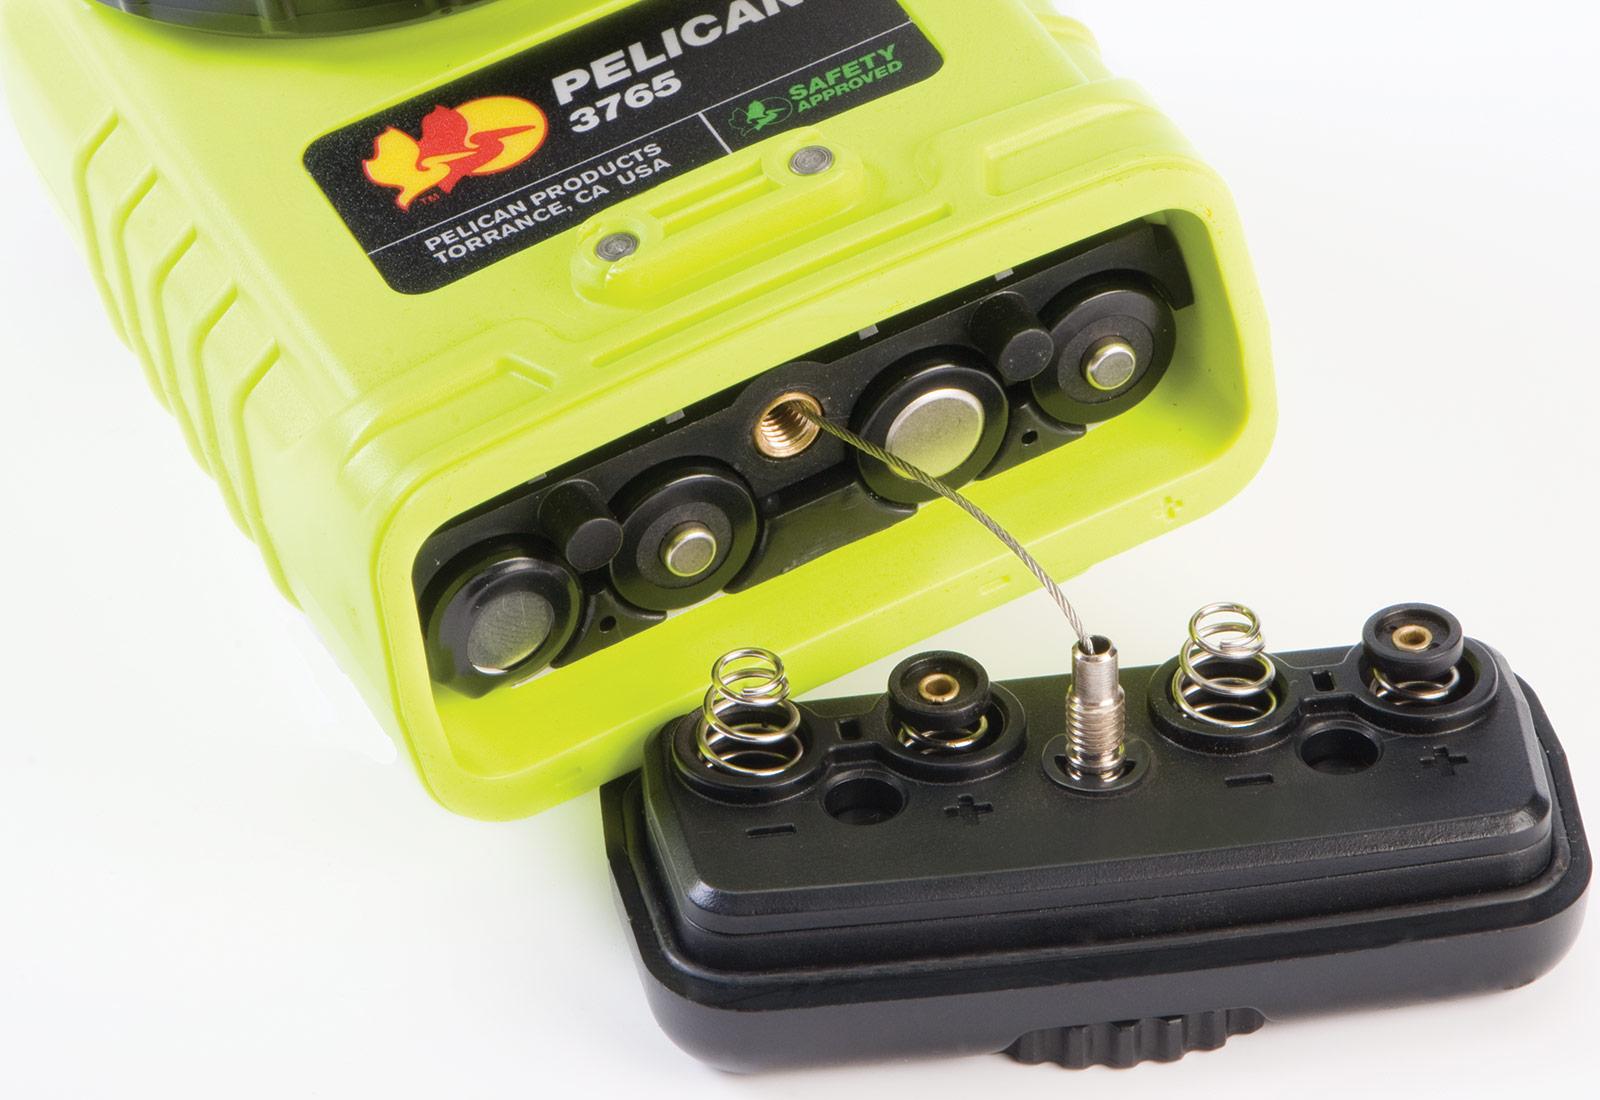 pelican 3765 yellow light battery chamber